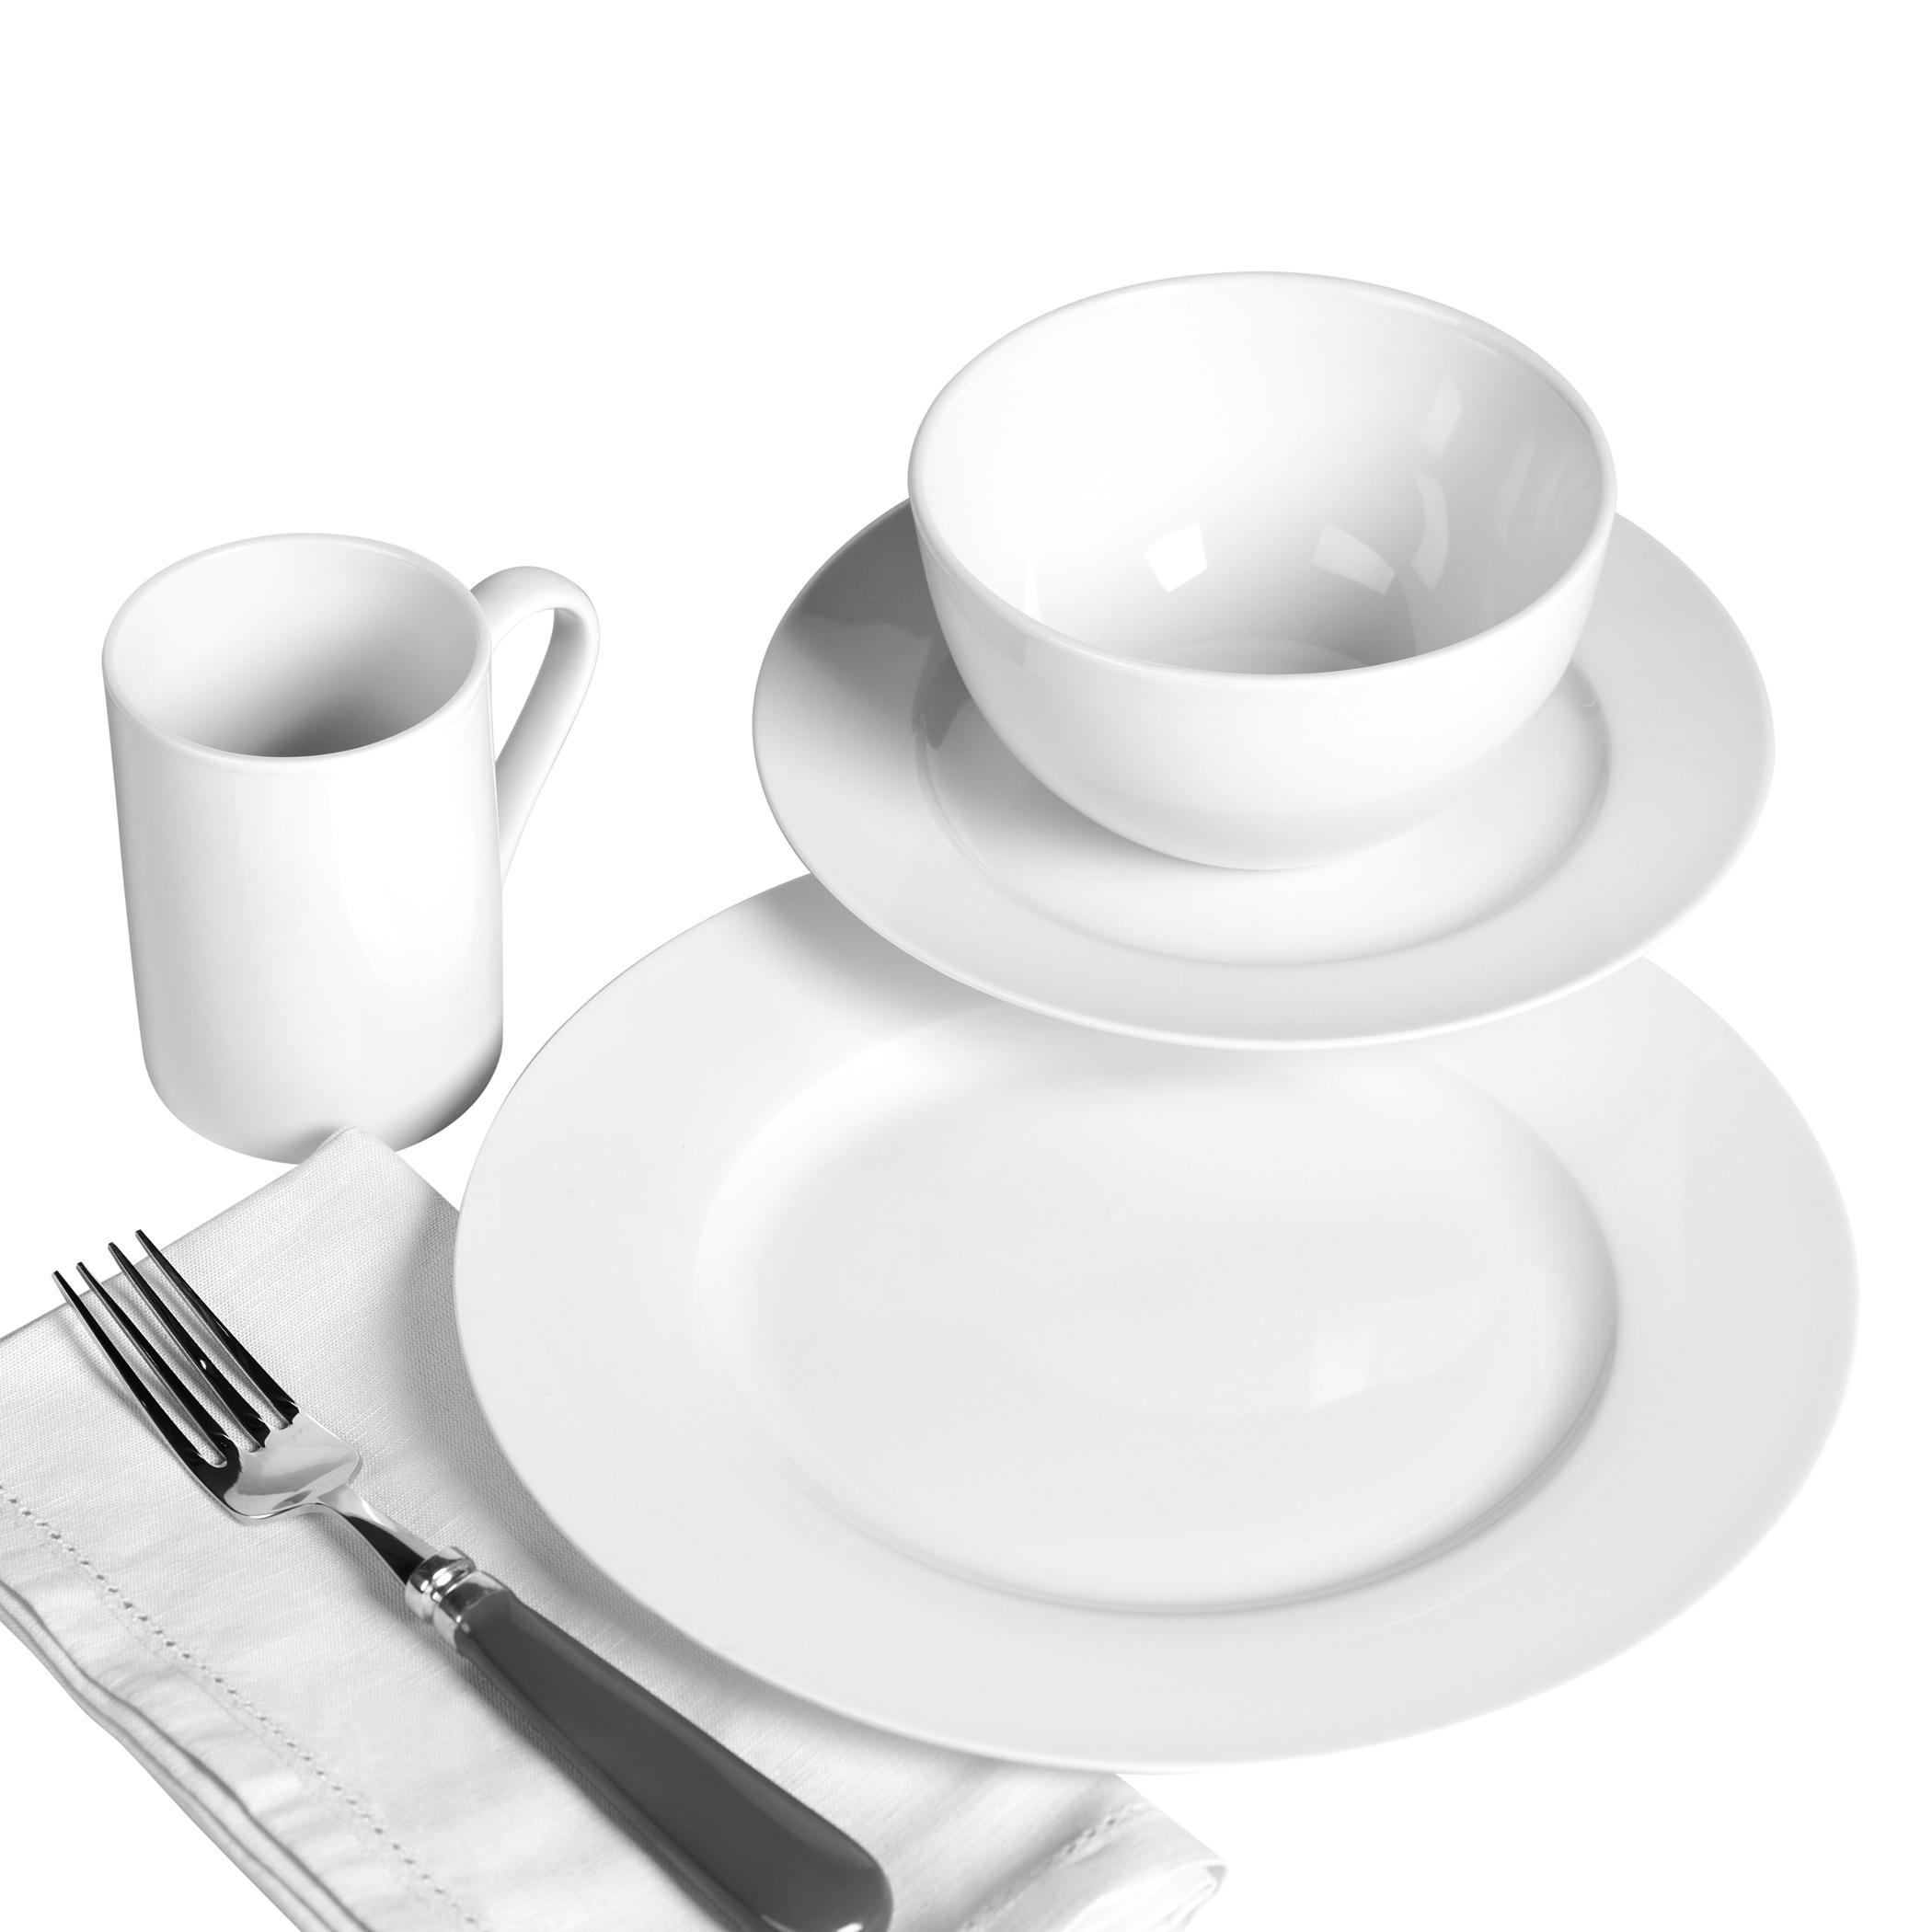 Tabletops Unlimited 16PC Porcelain Dinnerware Set- Soleil